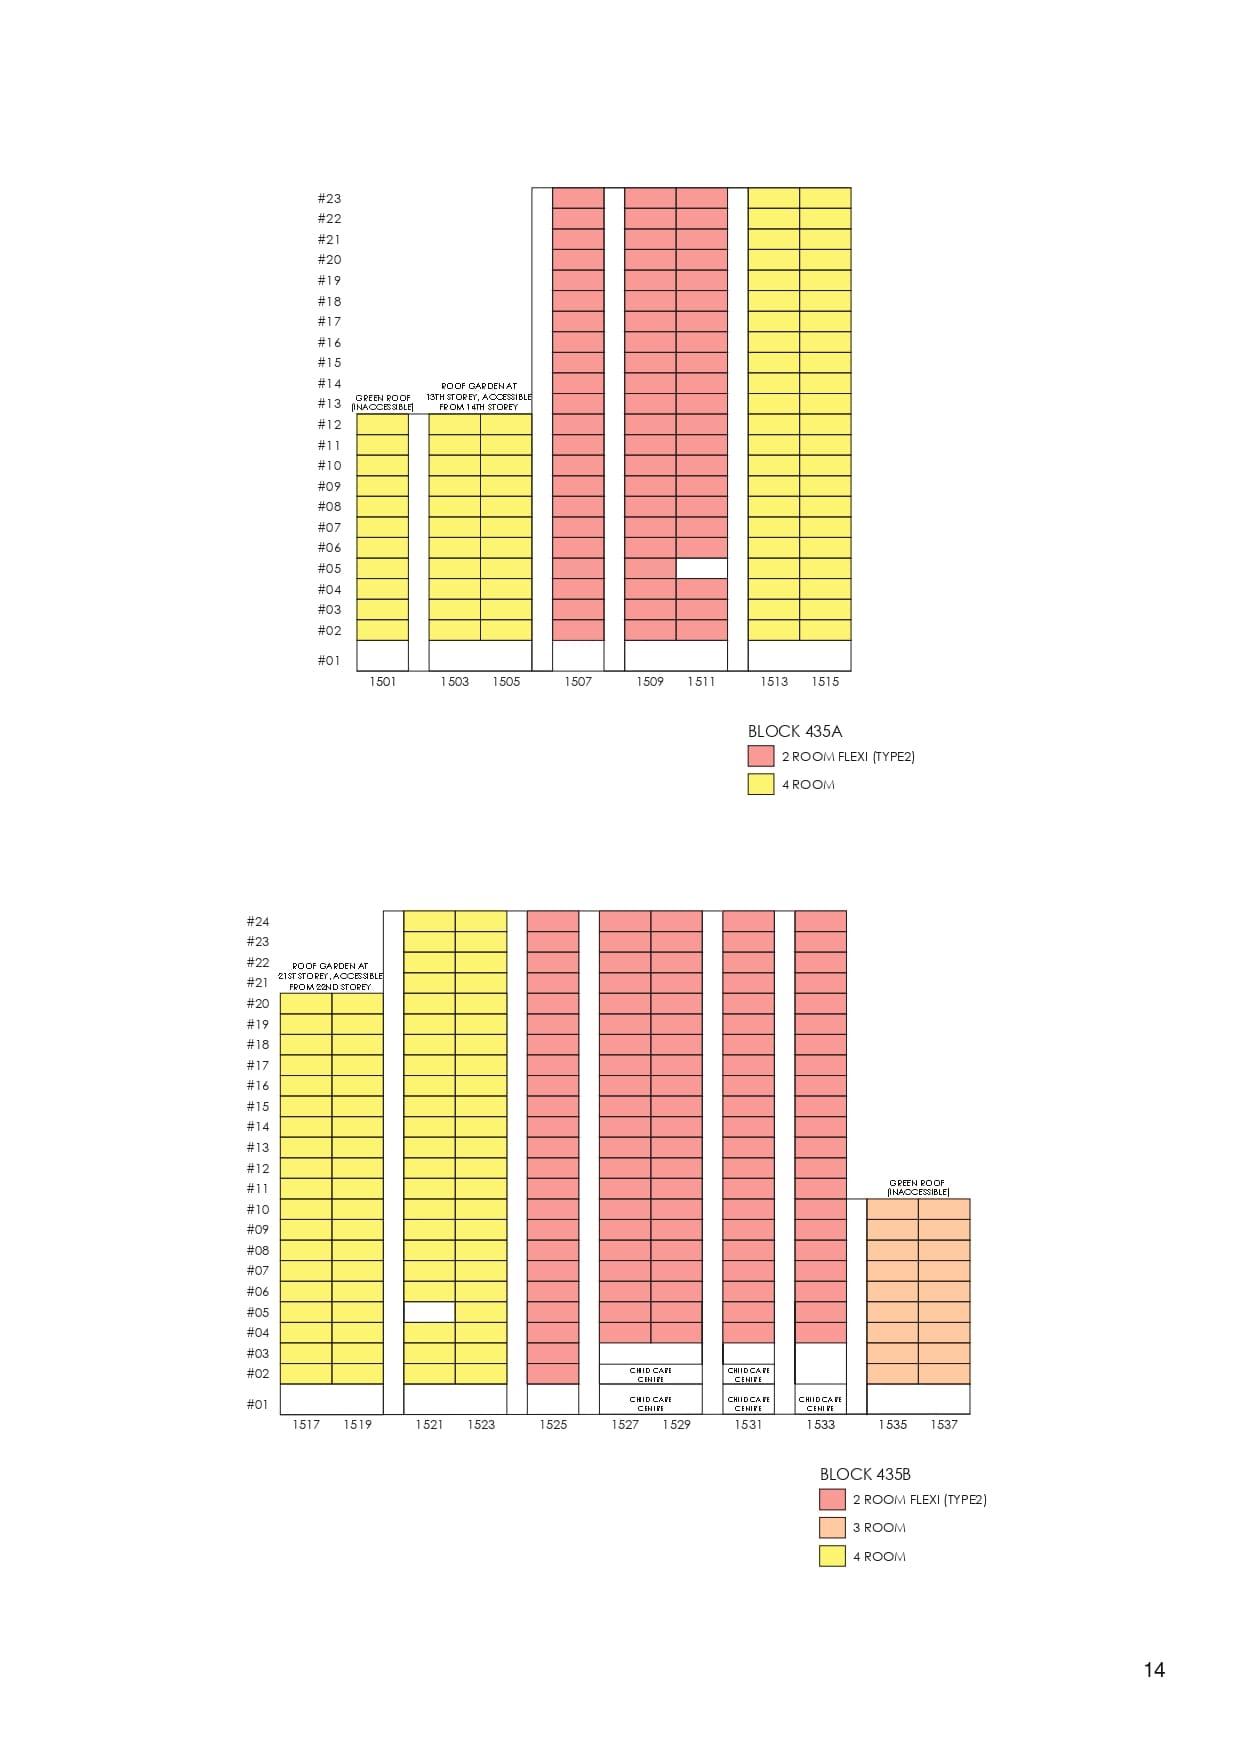 Punggol Point Crown Unit Distribution